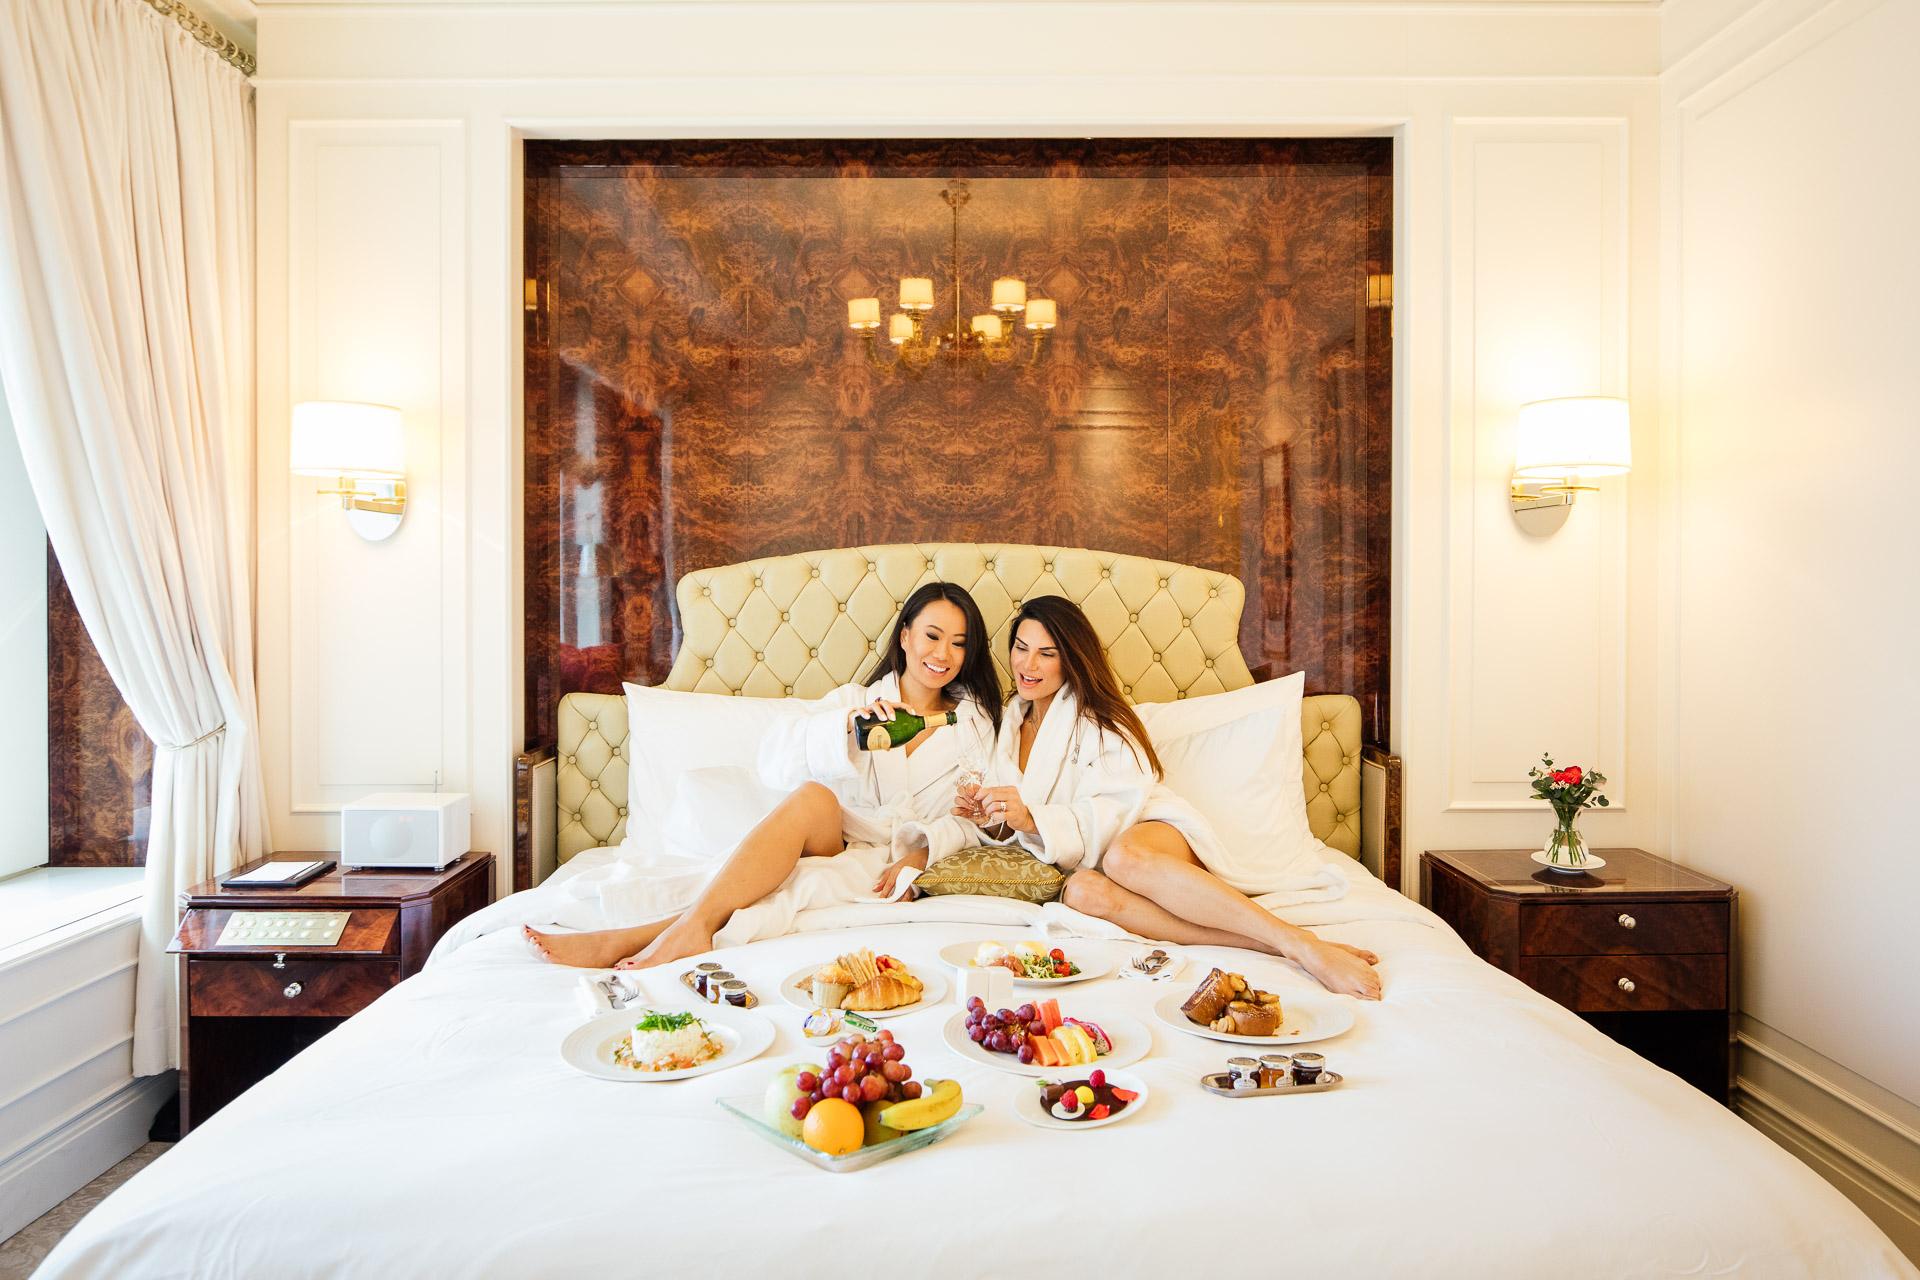 st-regis-singapore-marriott-luxury-hotel-photographer-10.jpg